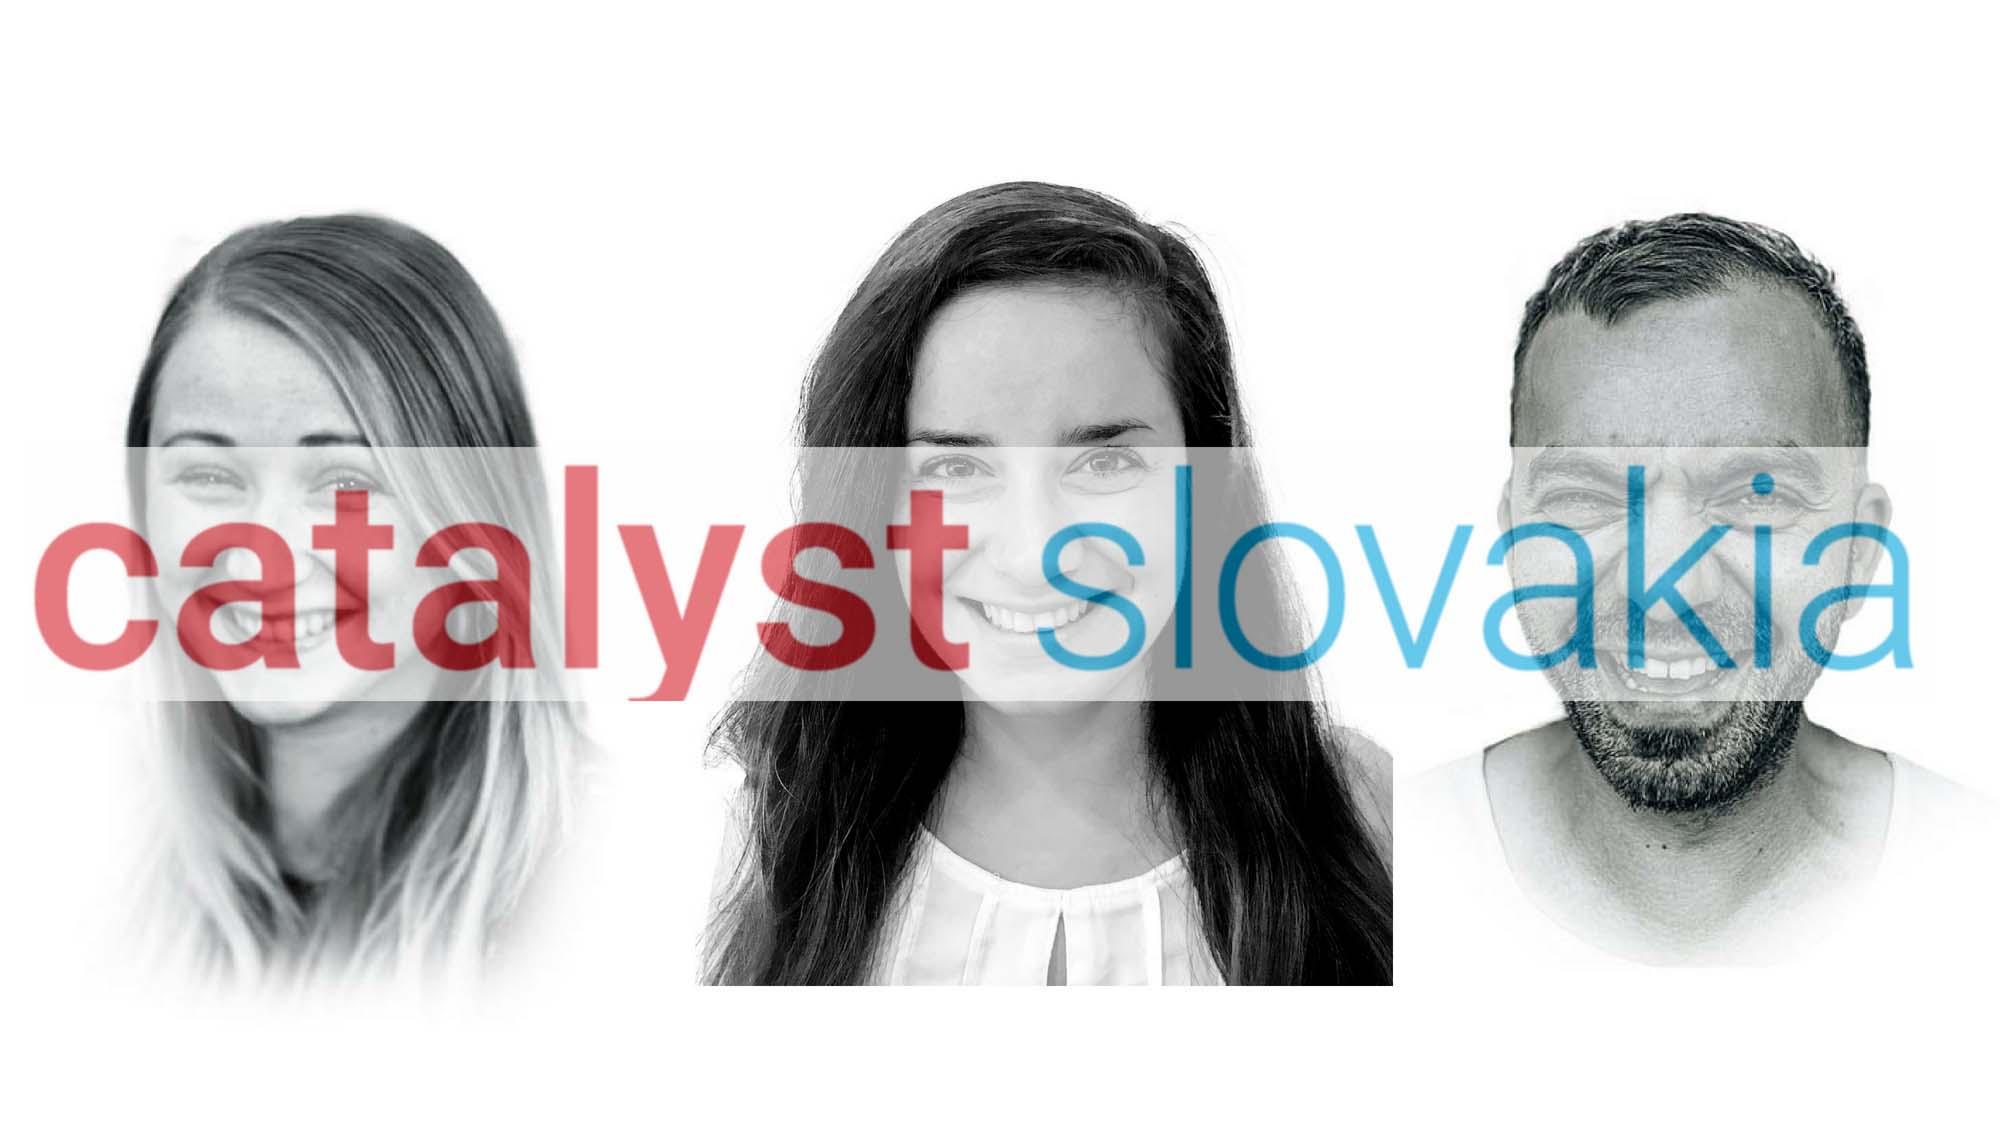 Catalyst Slovakia team